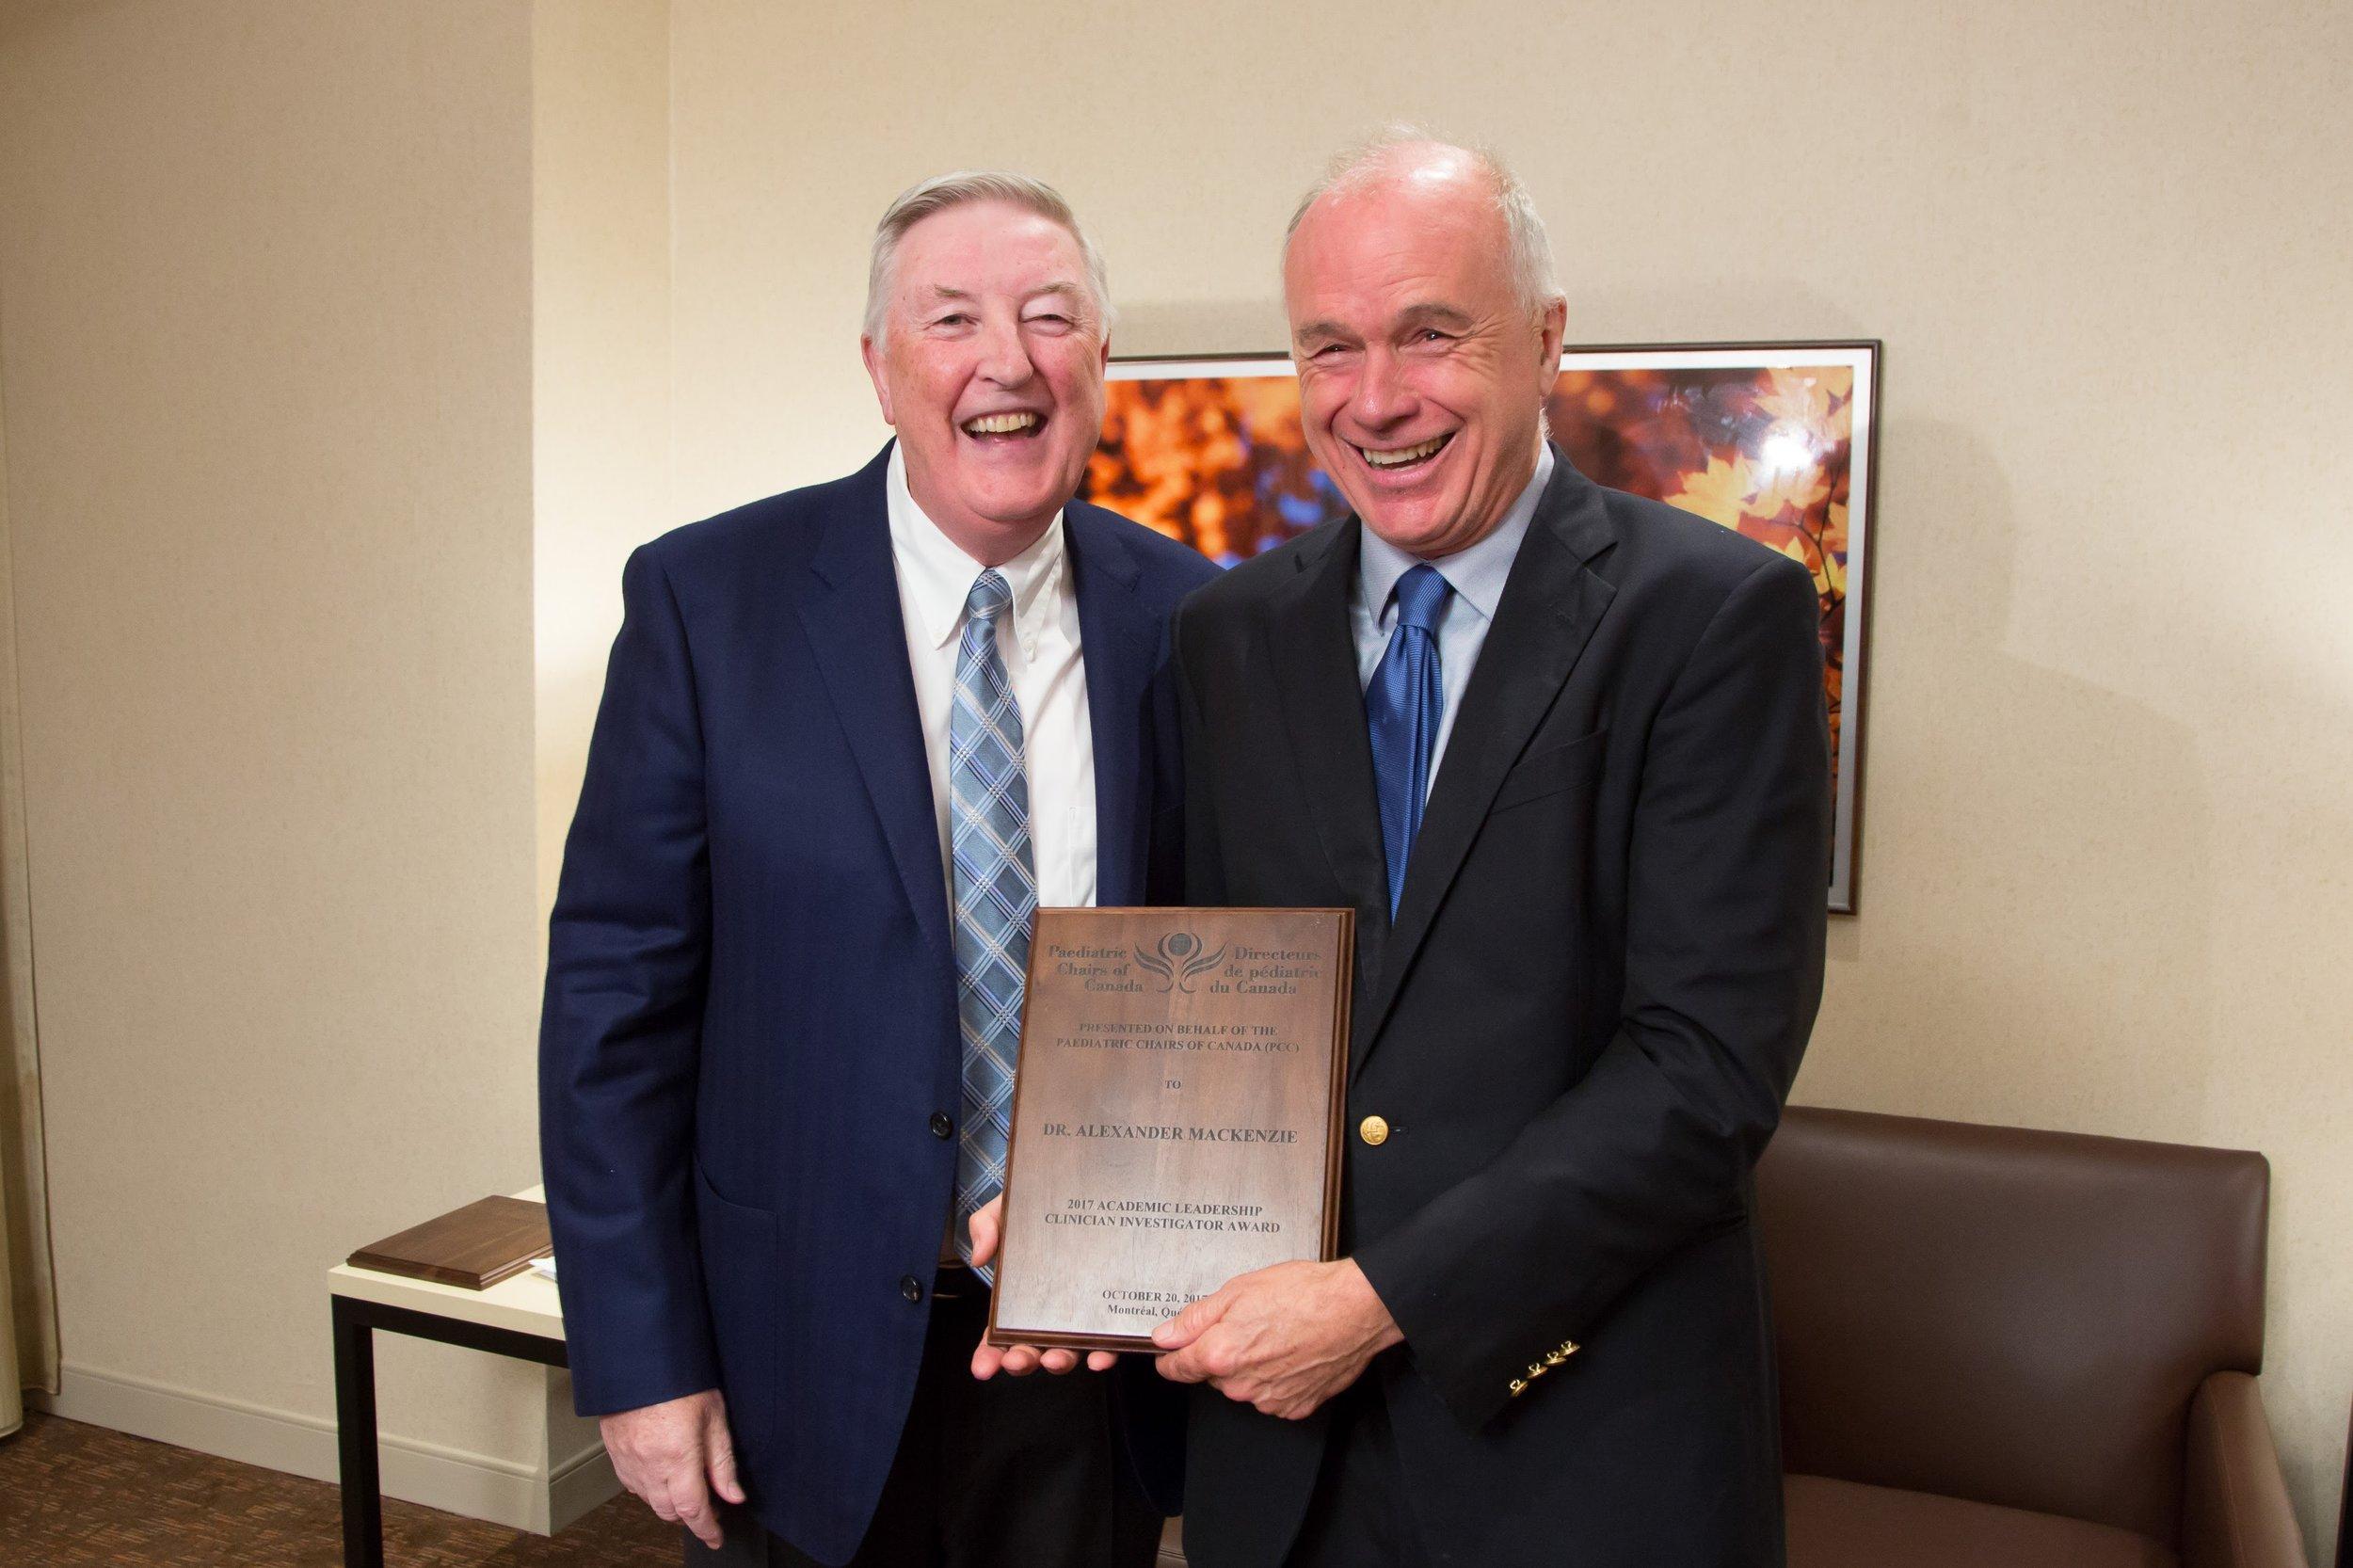 Dr. Ciarán Duffy and Dr. Alexander MacKenzie (Clinician Investigator - University of Ottawa / CHEO)